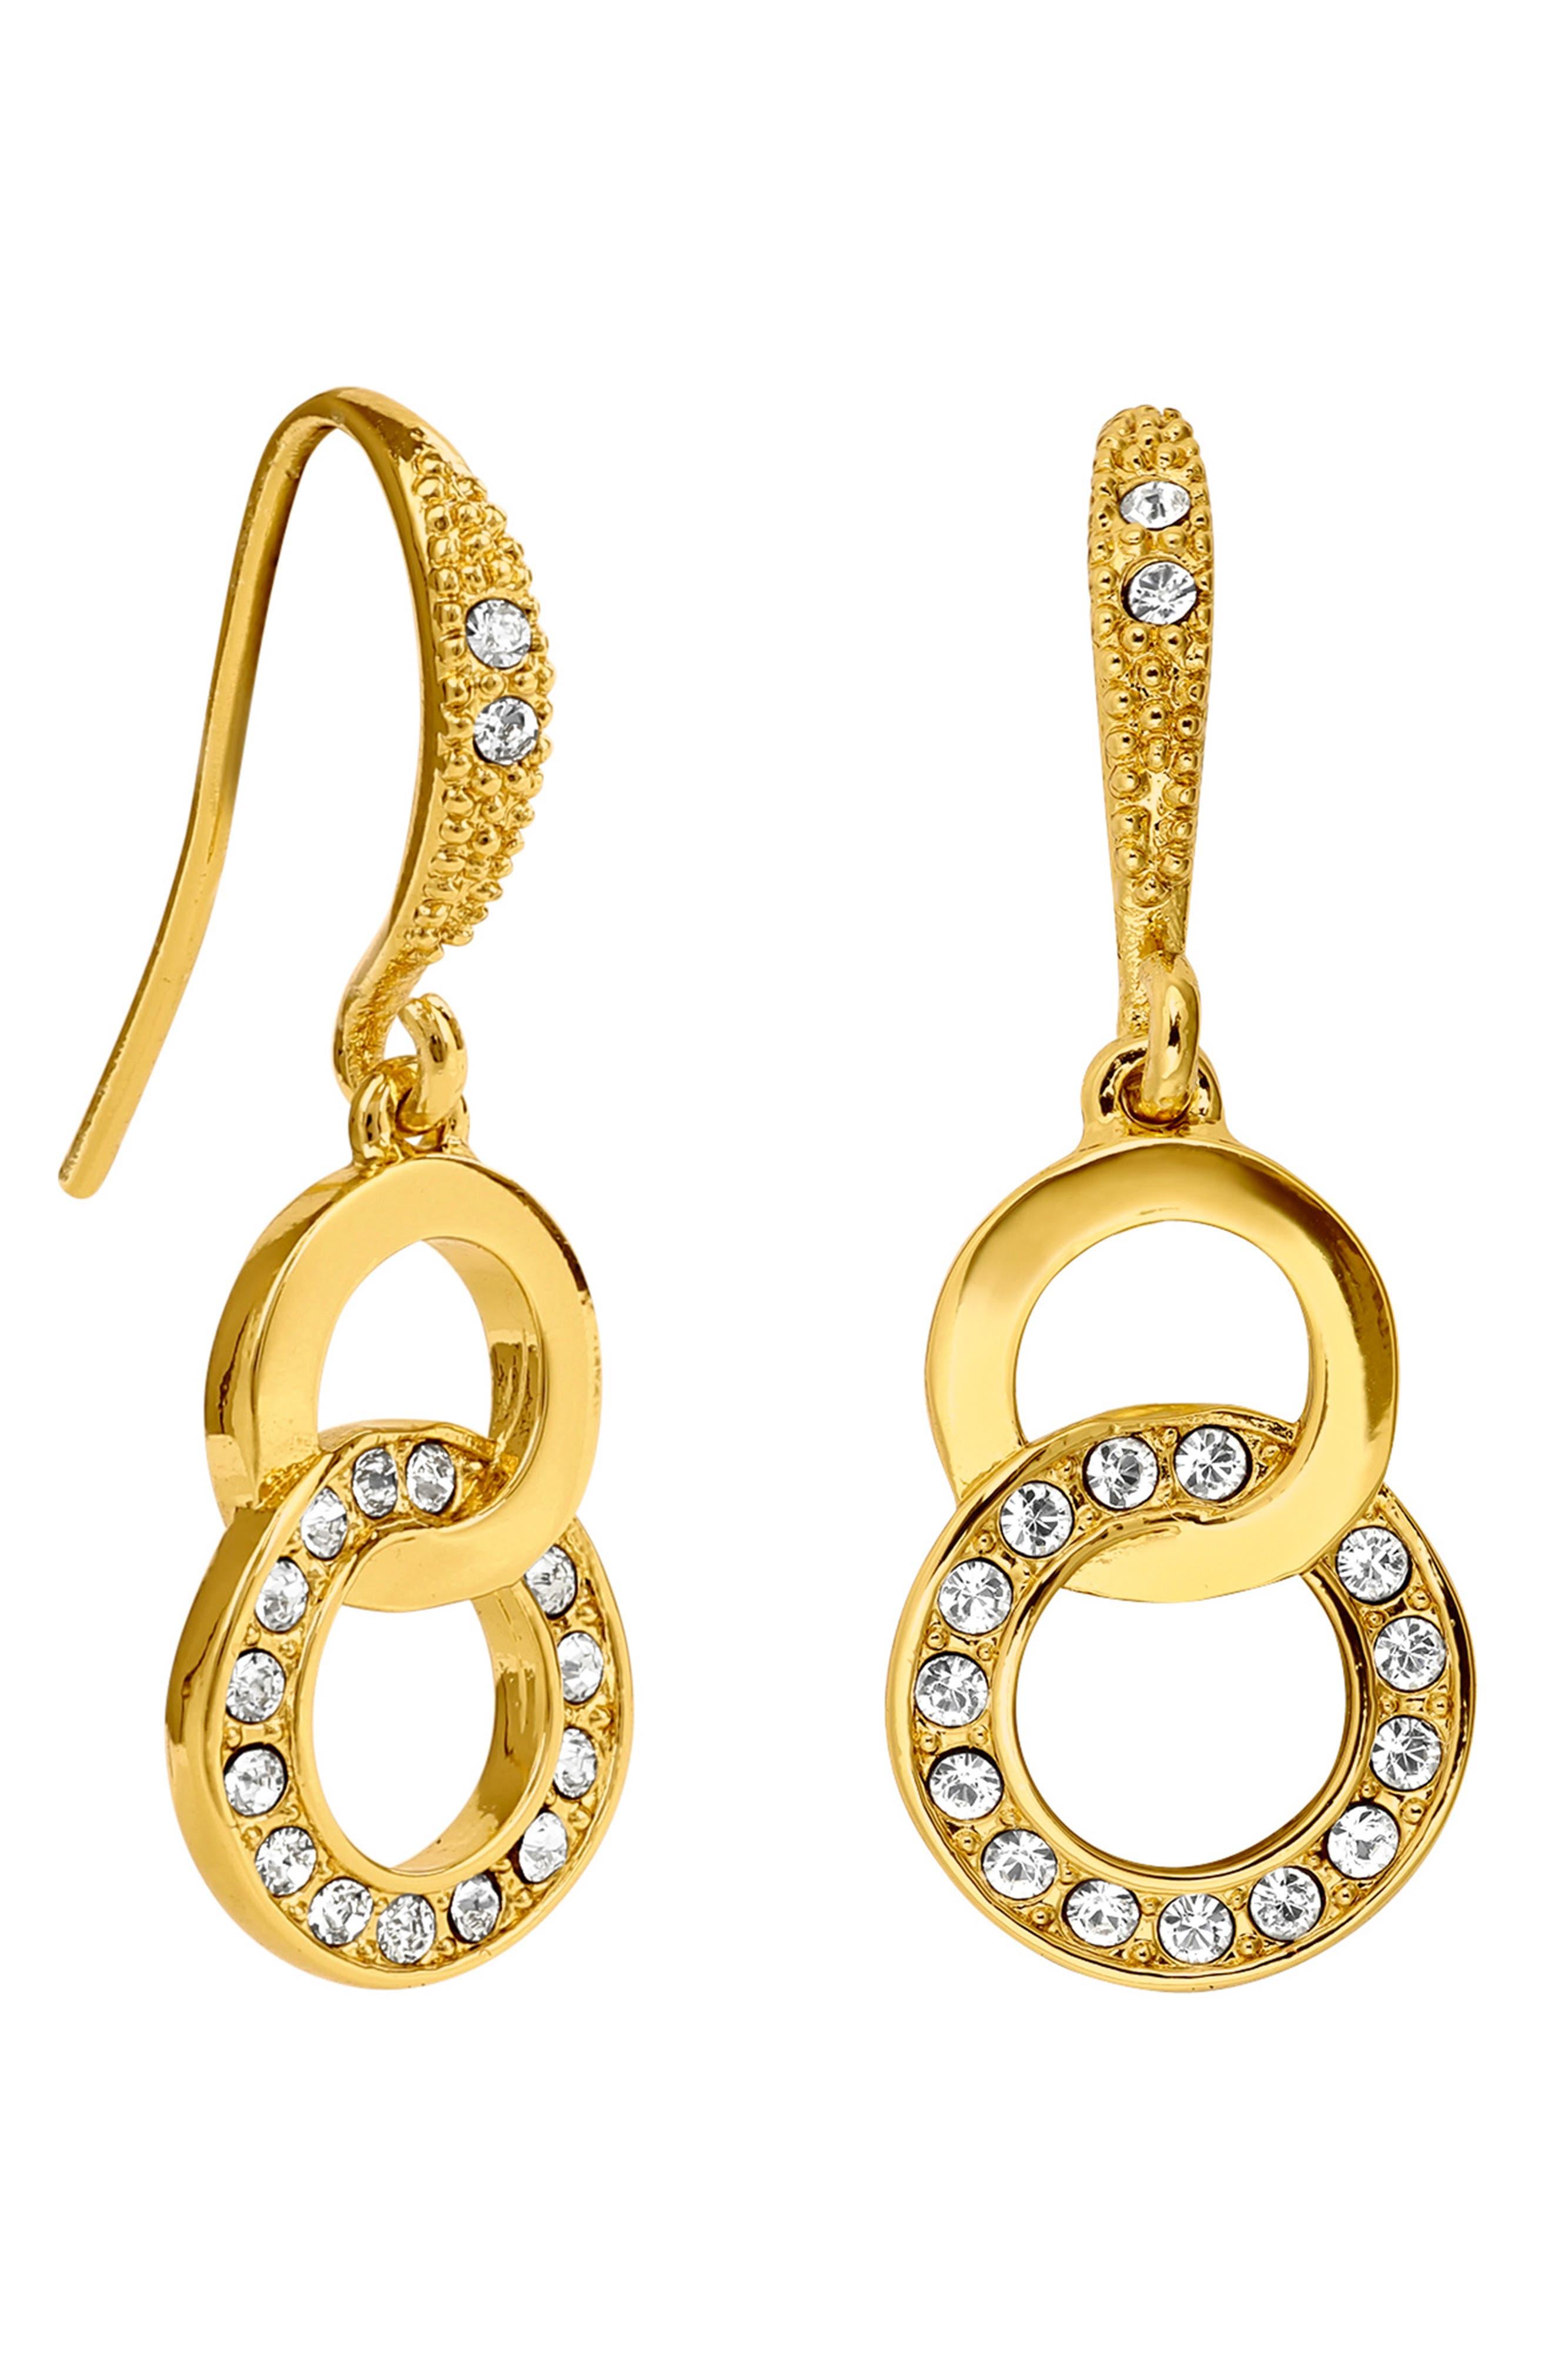 Interlocking Ring Drop Earrings,                         Main,                         color, GOLD